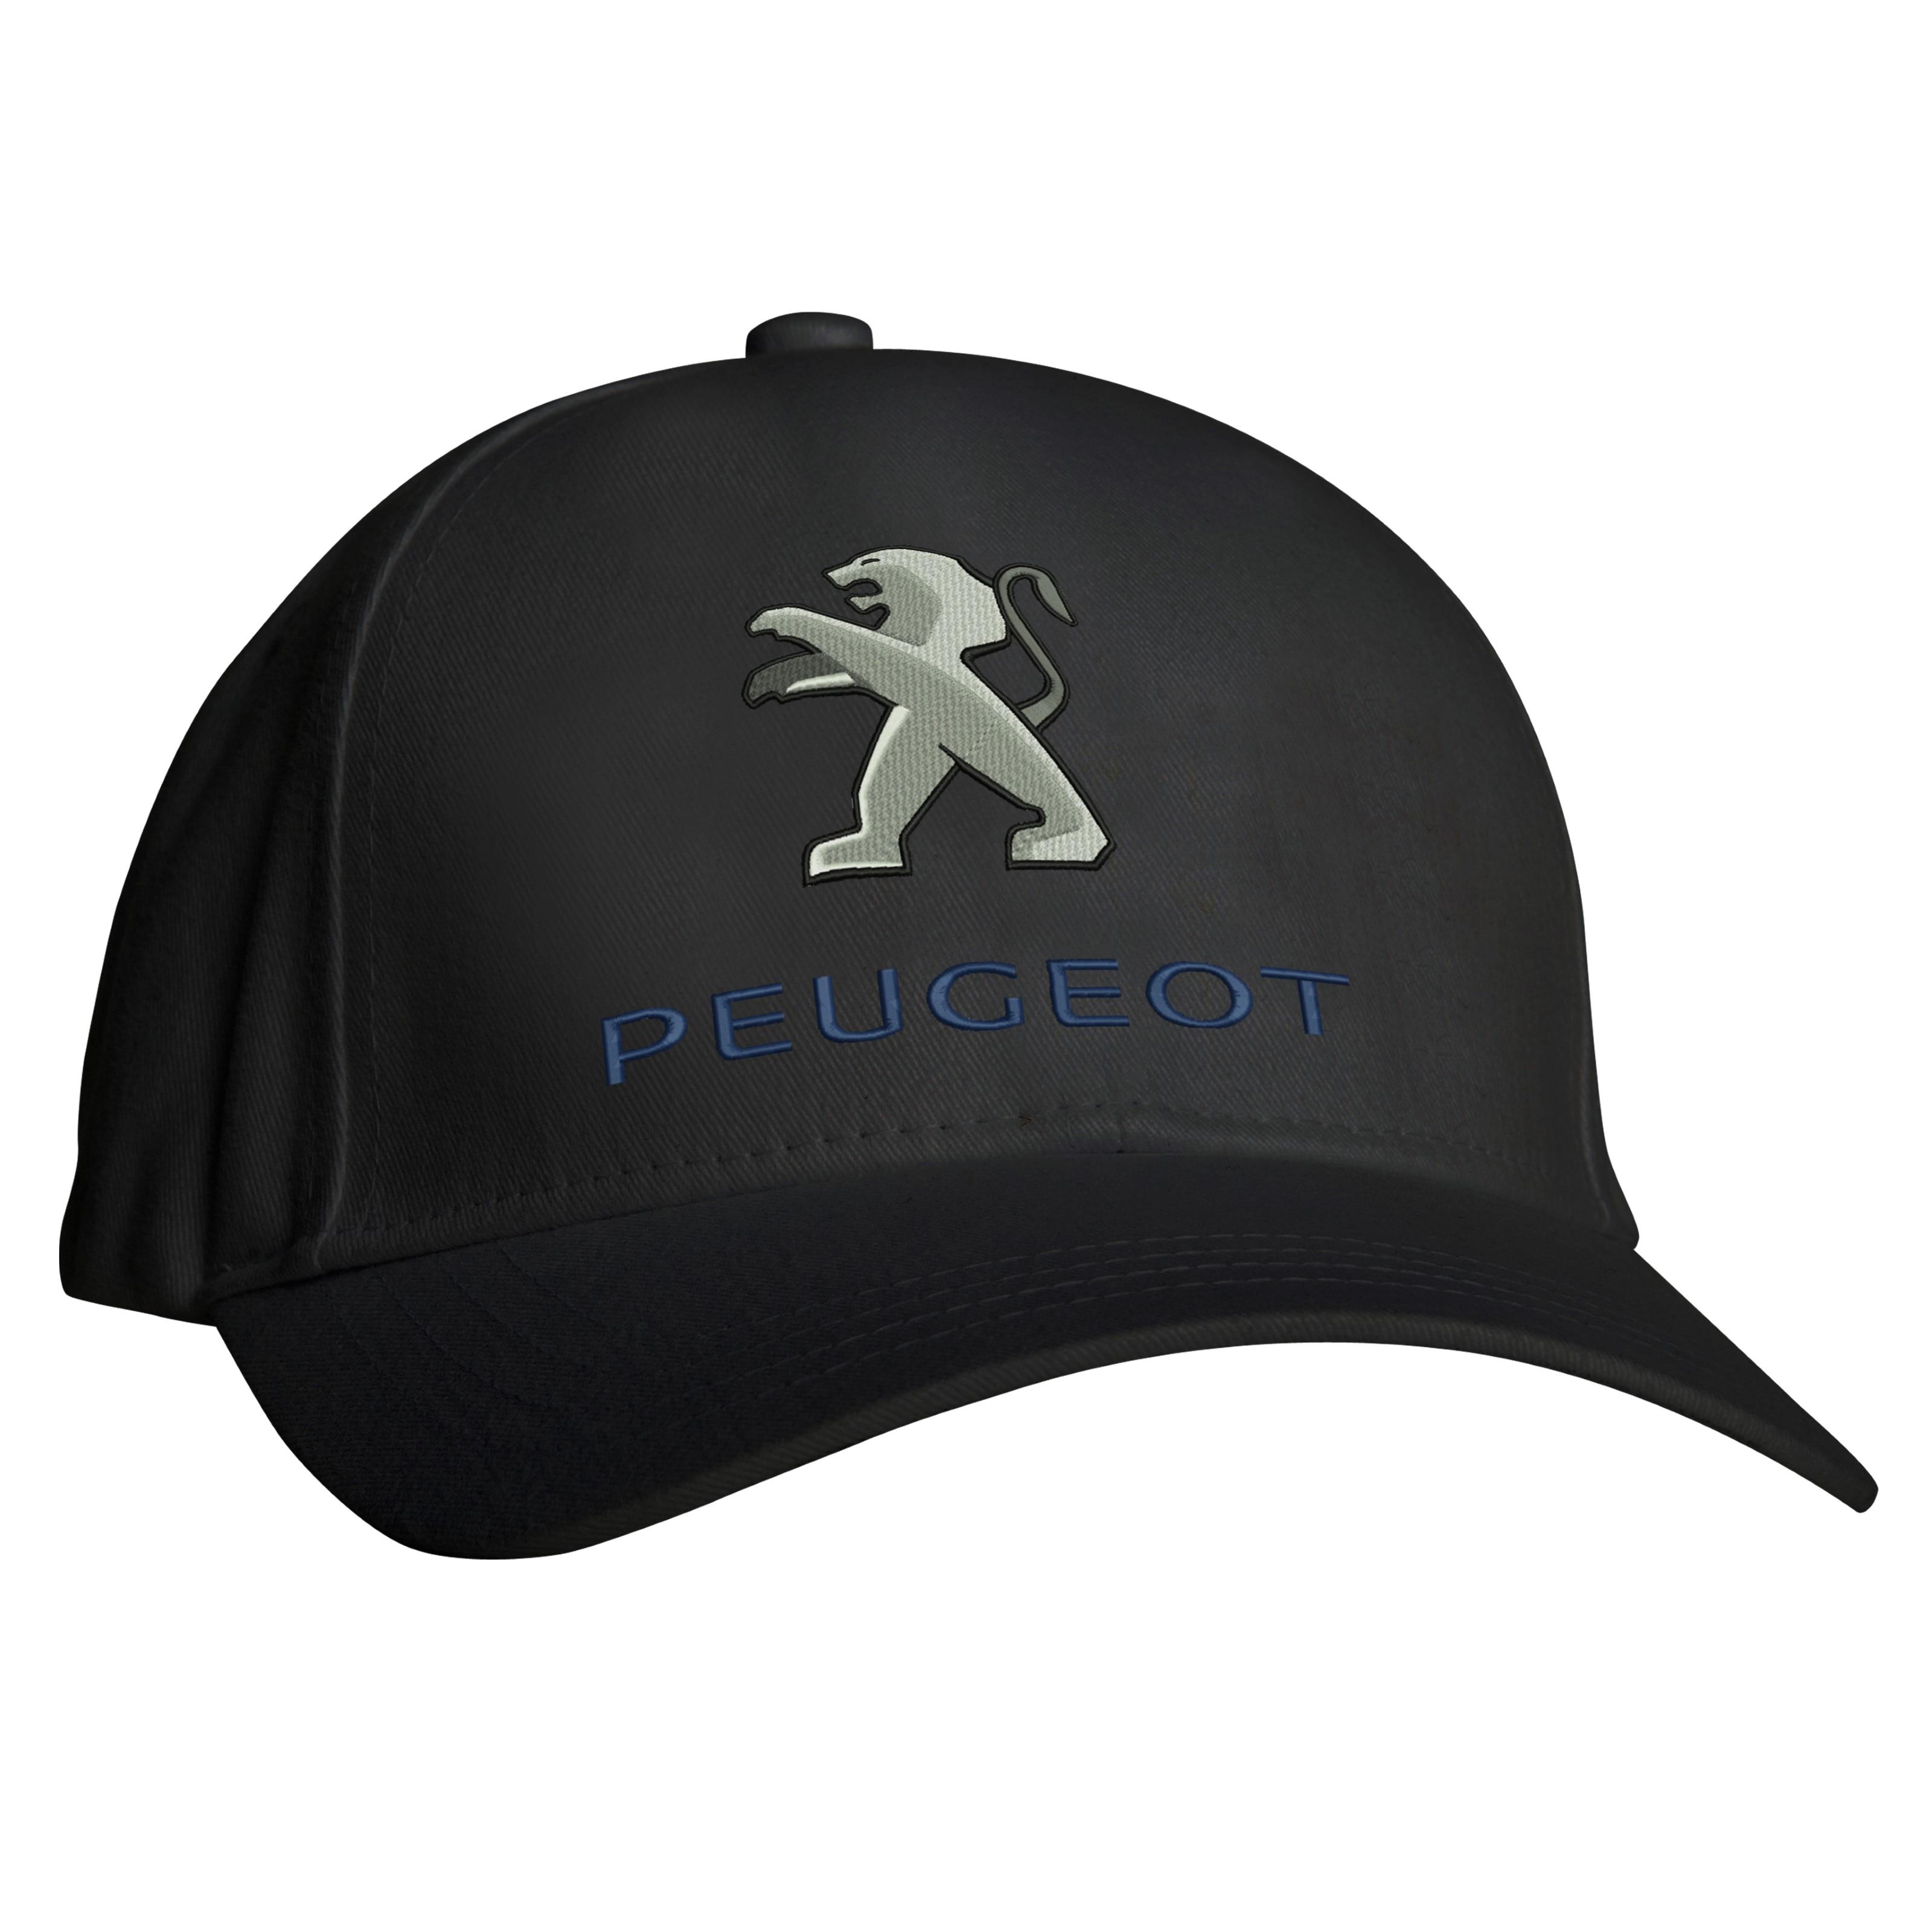 1e851ed1ad7 Buy caps uniform and get free shipping on AliExpress.com